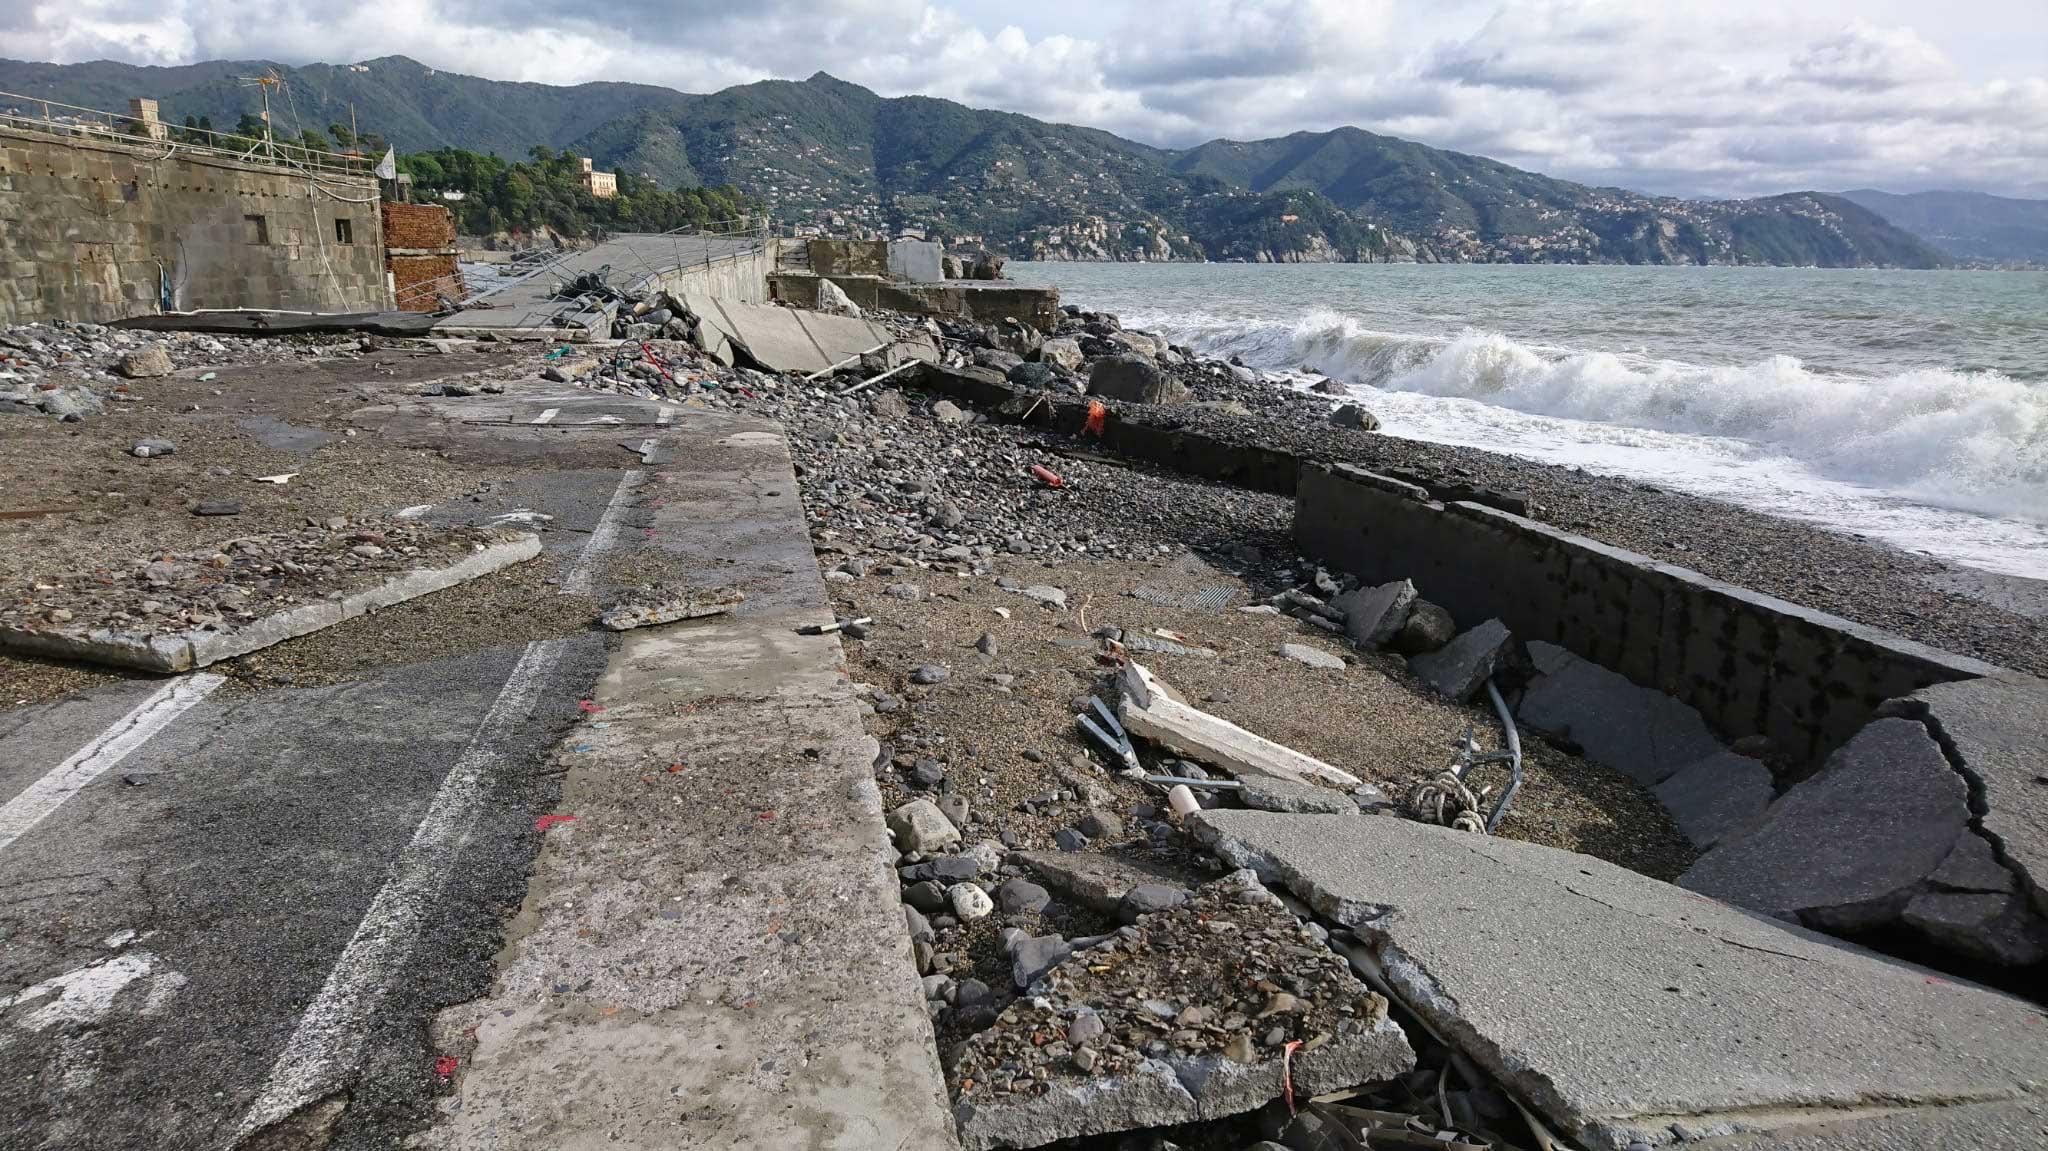 Mareggiata ai Bagni Sirena - Santa Margherita Ligure 2018